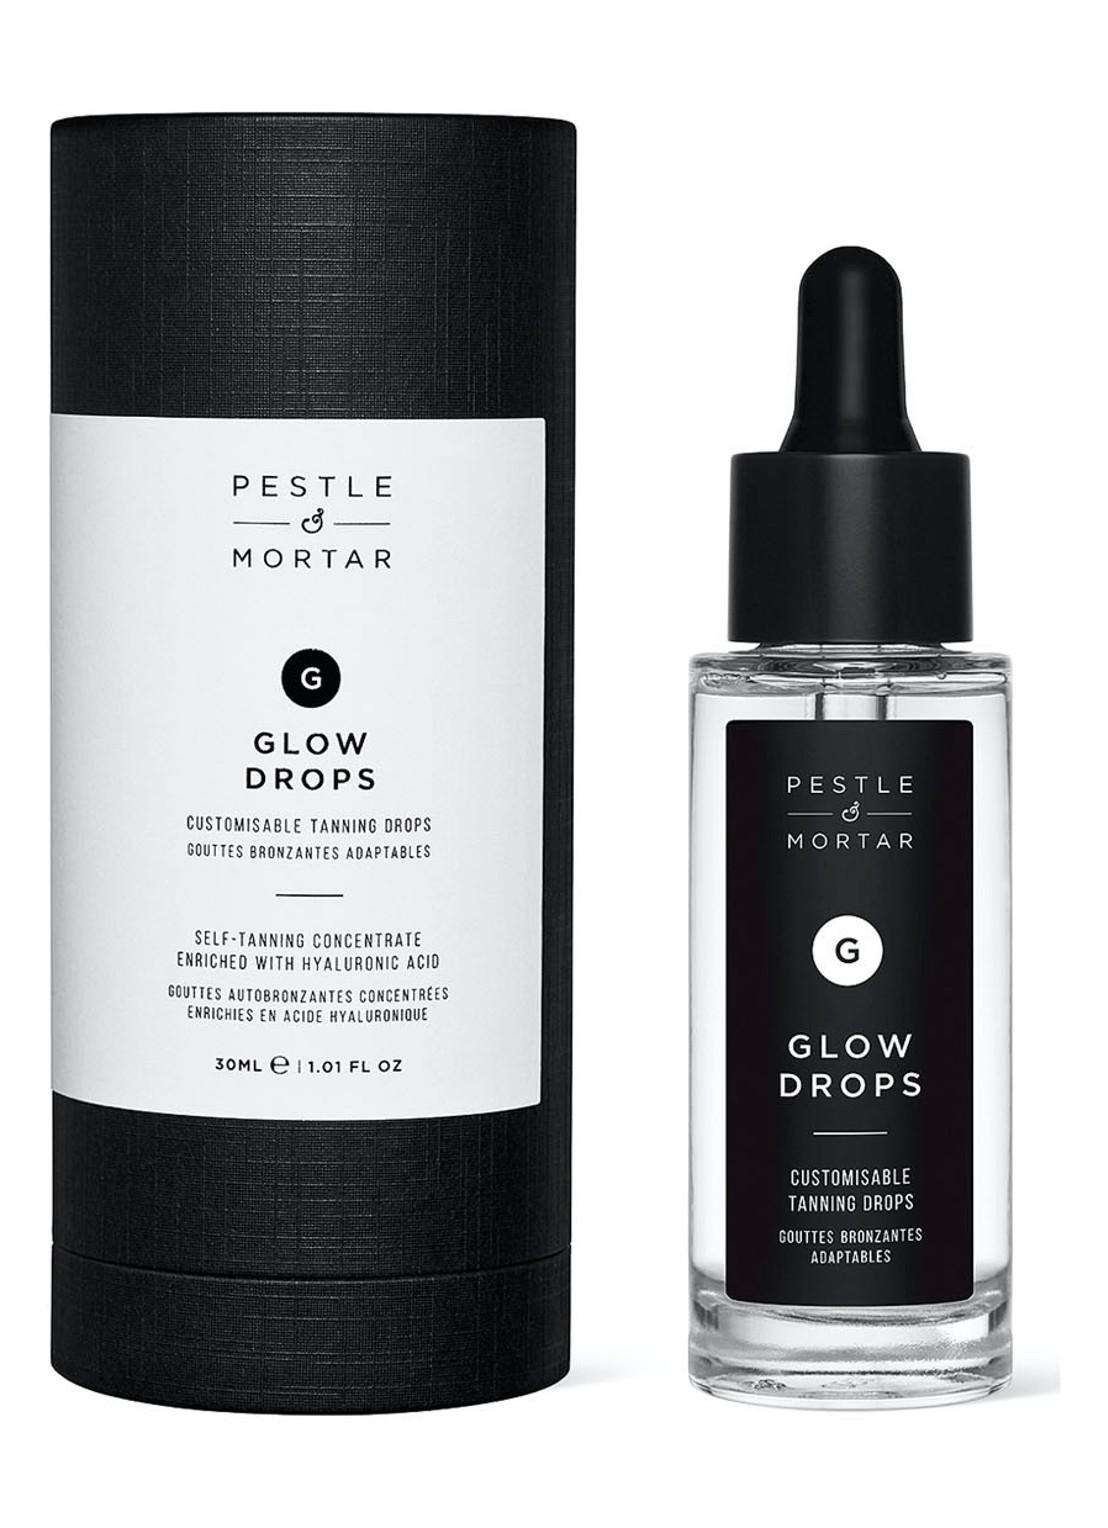 pestle mortar glow drops